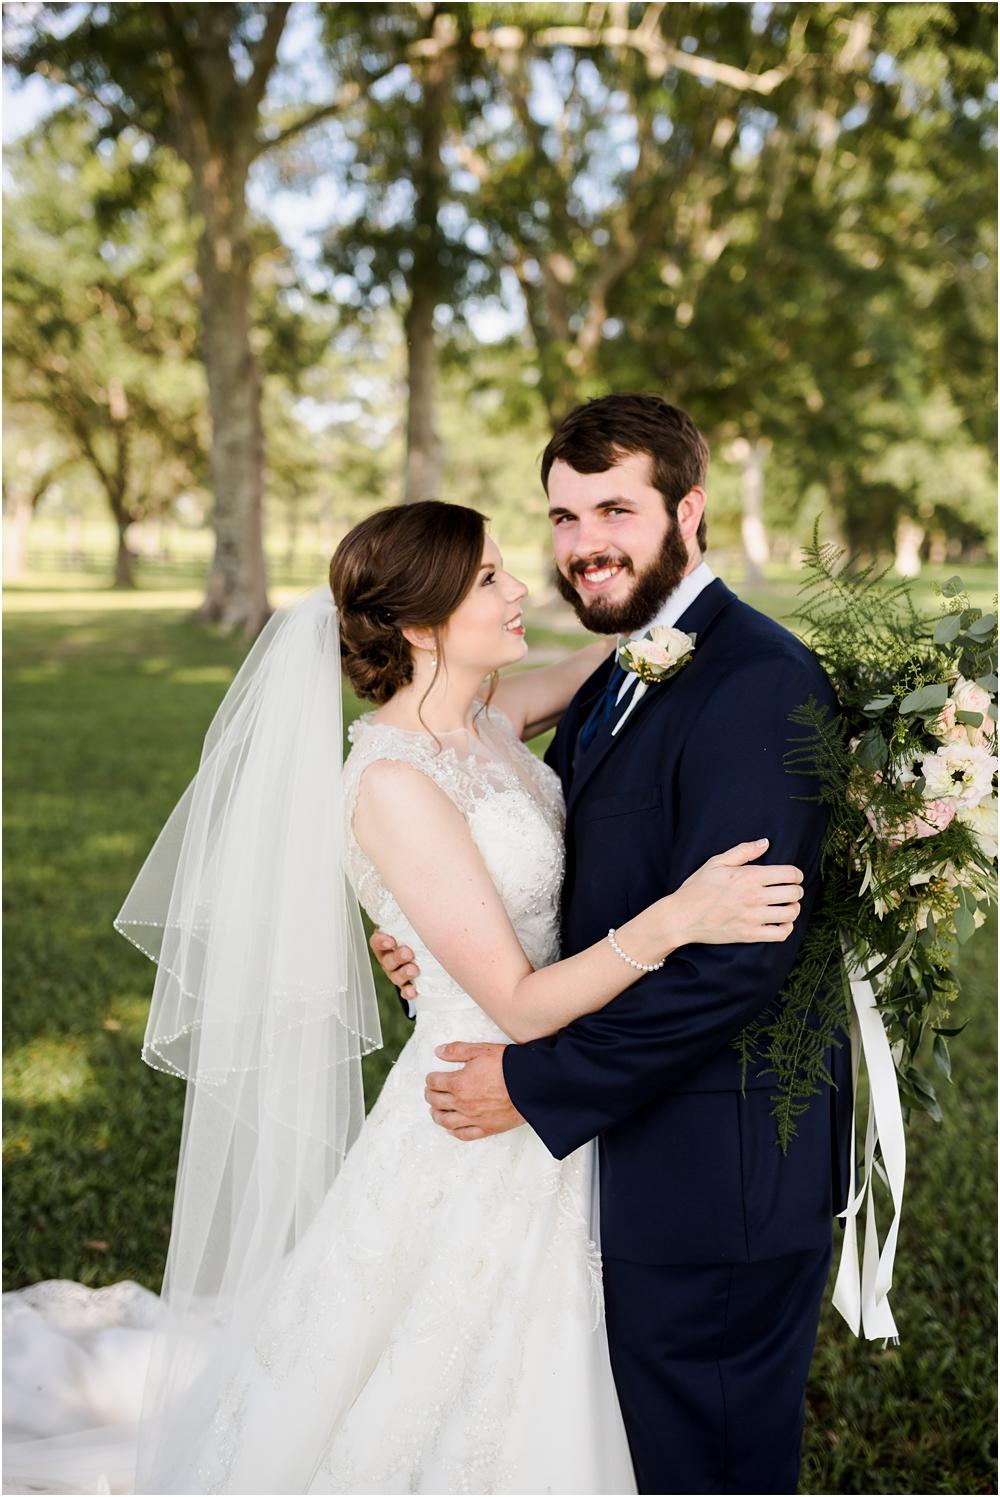 marianna-florida-wedding-photographer-kiersten-grant-74.jpg